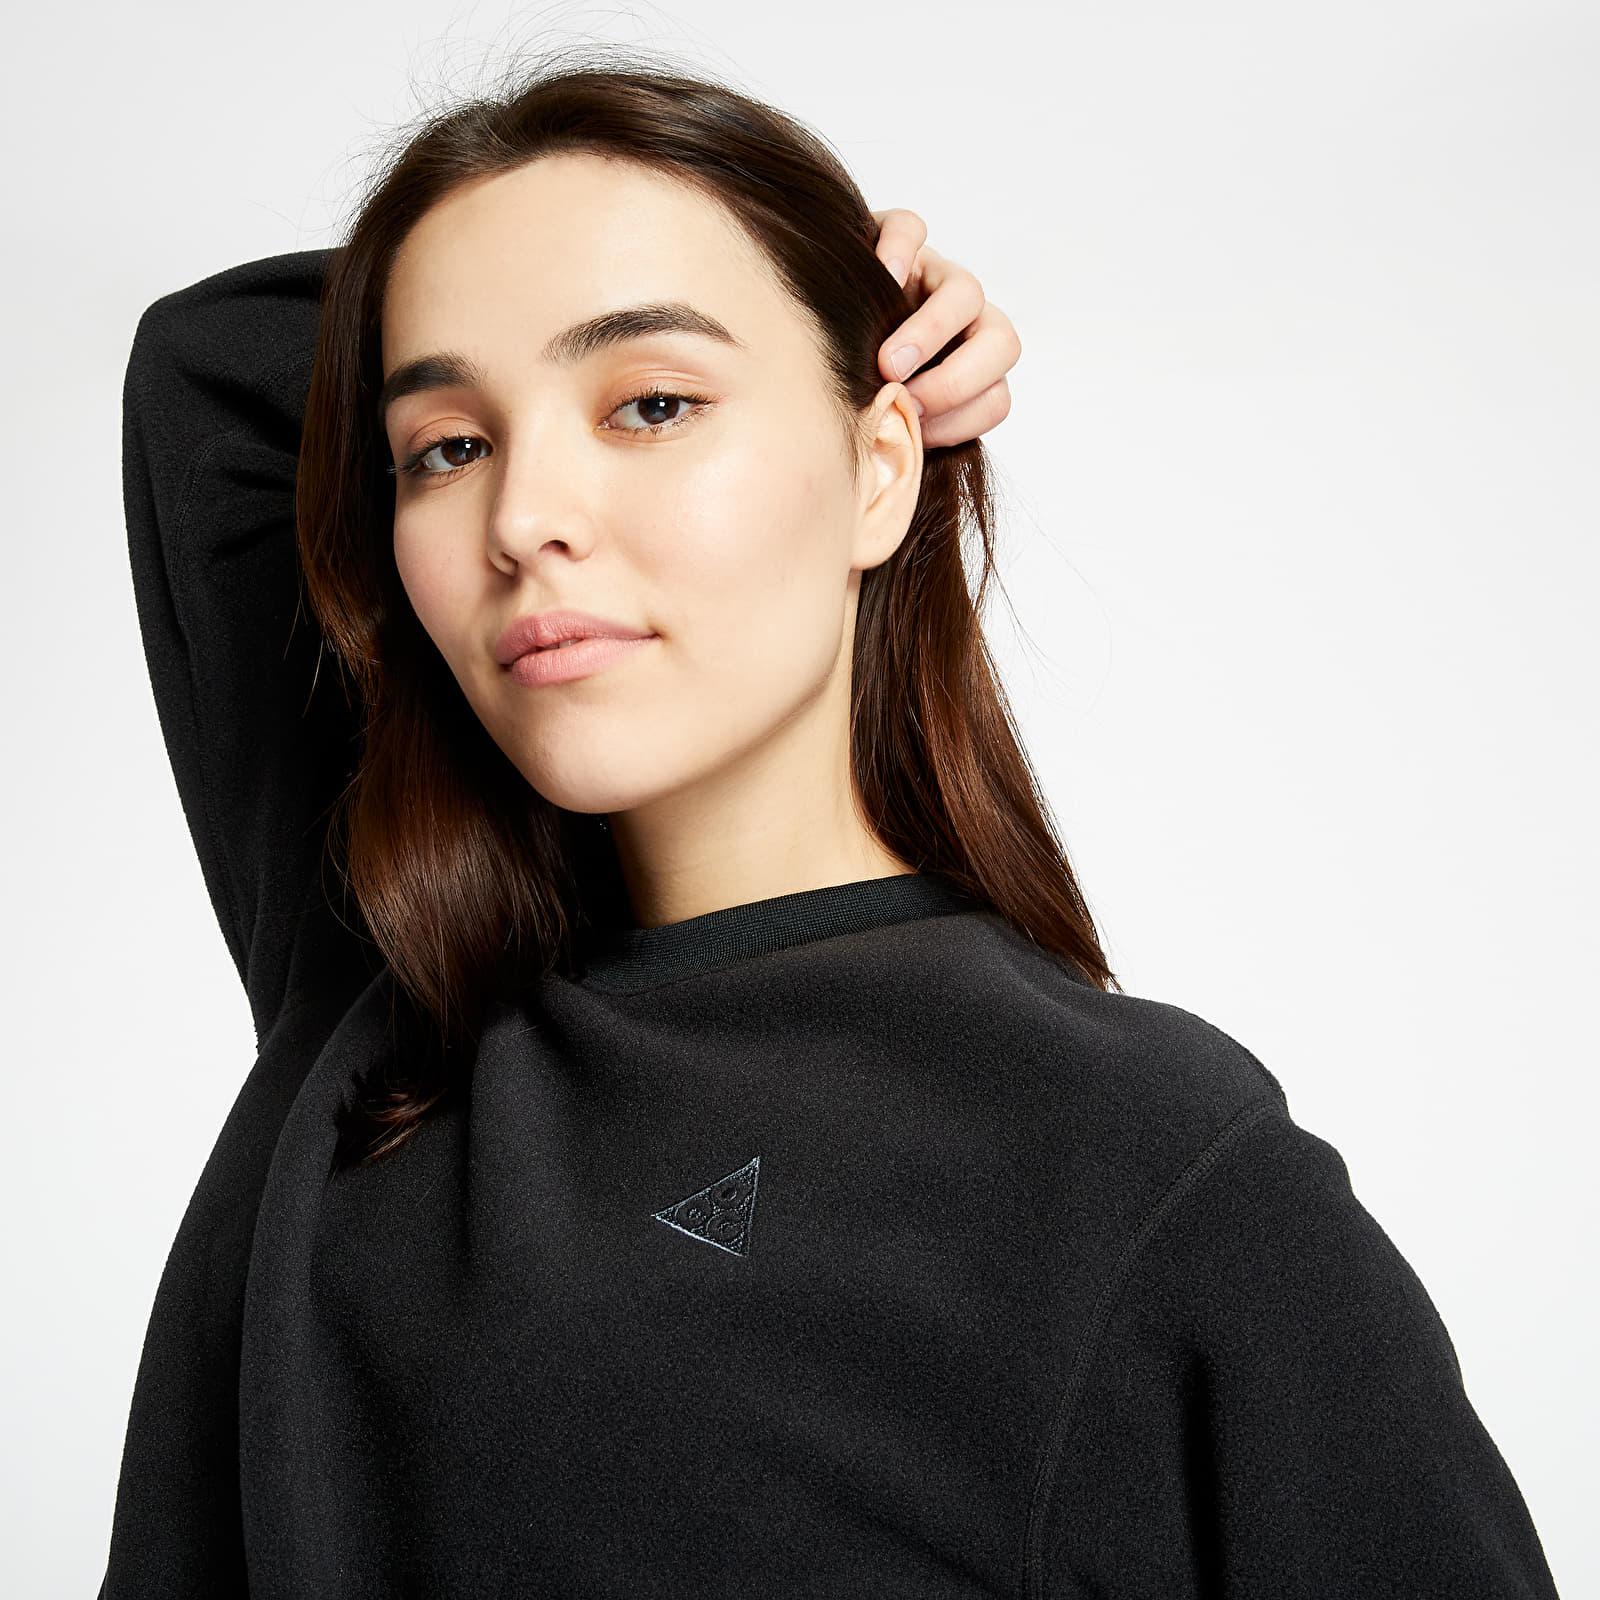 Sweatshirts Nike Nrg ACG Polar Crew Black/ Anthracite/ Anthracite